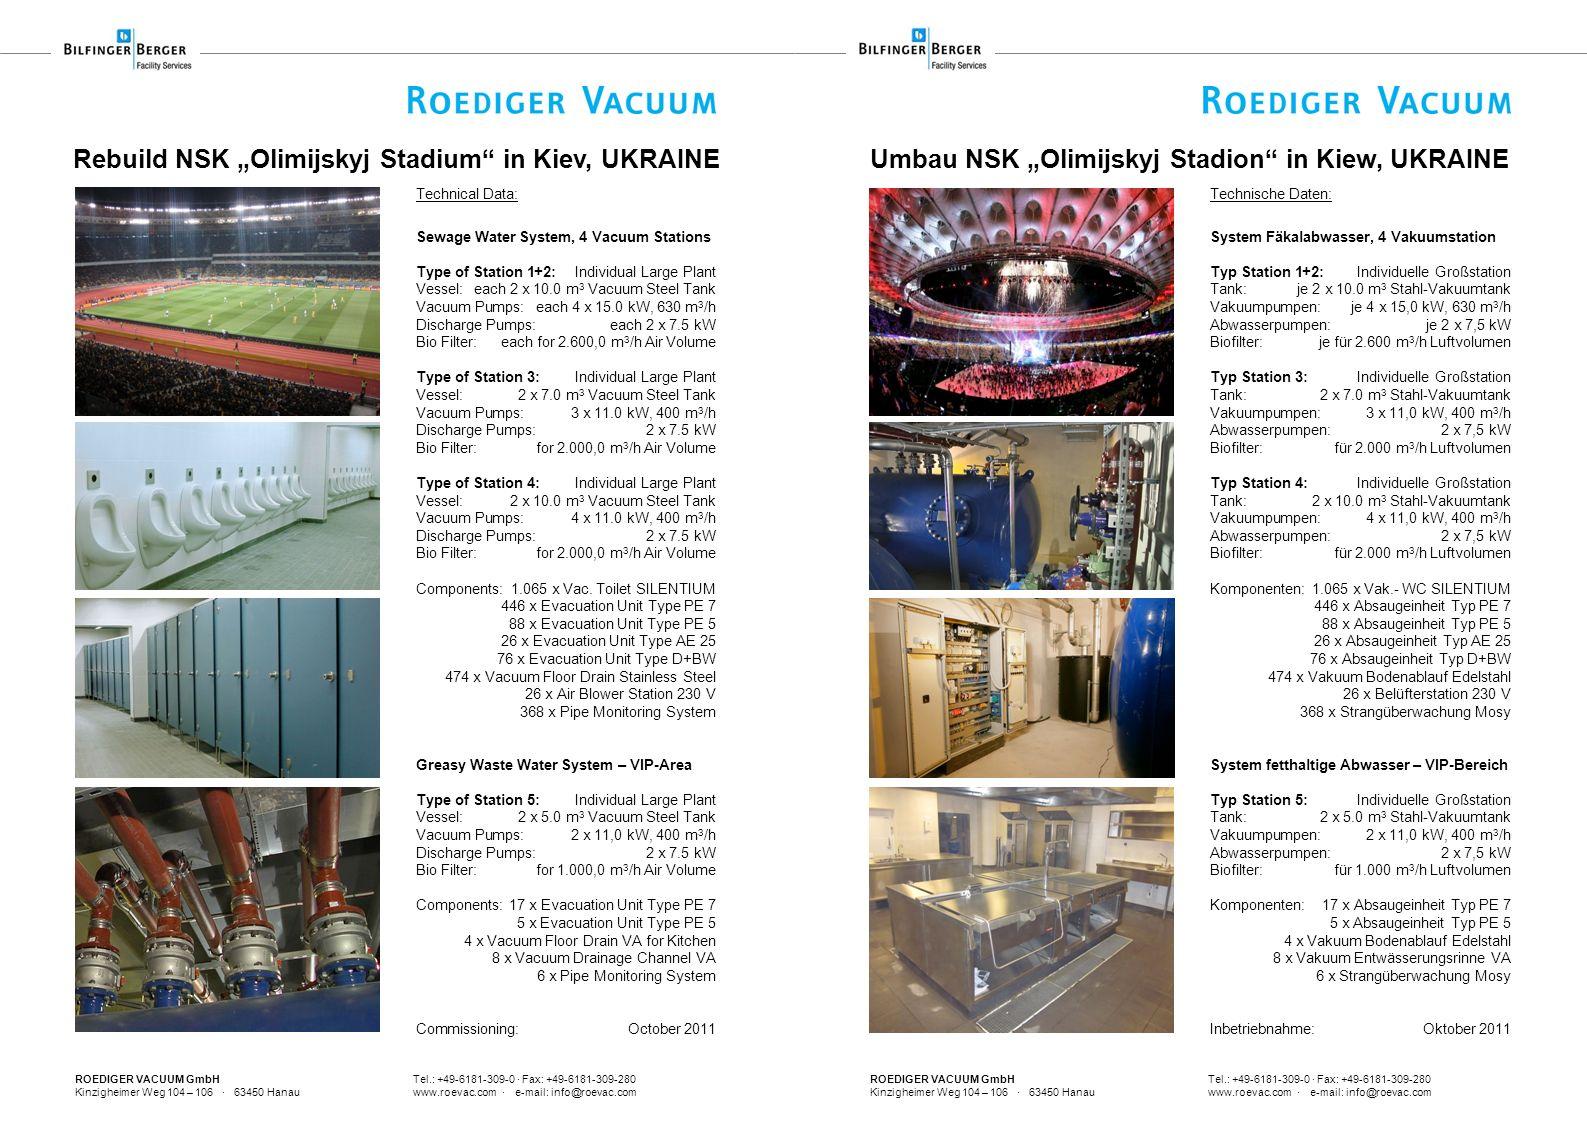 ROEDIGER VACUUM GmbH Tel.: +49-6181-309-0 · Fax: +49-6181-309-280 Kinzigheimer Weg 104 – 106 · 63450 Hanau www.roevac.com · e-mail: info@roevac.com Technical Data: Sewage Water System, 4 Vacuum Stations Type of Station 1+2:Individual Large Plant Vessel:each 2 x 10.0 m 3 Vacuum Steel Tank Vacuum Pumps:each 4 x 15.0 kW, 630 m 3 /h Discharge Pumps:each 2 x 7.5 kW Bio Filter:each for 2.600,0 m 3 /h Air Volume Type of Station 3:Individual Large Plant Vessel:2 x 7.0 m 3 Vacuum Steel Tank Vacuum Pumps:3 x 11.0 kW, 400 m 3 /h Discharge Pumps:2 x 7.5 kW Bio Filter:for 2.000,0 m 3 /h Air Volume Type of Station 4:Individual Large Plant Vessel:2 x 10.0 m 3 Vacuum Steel Tank Vacuum Pumps:4 x 11.0 kW, 400 m 3 /h Discharge Pumps:2 x 7.5 kW Bio Filter:for 2.000,0 m 3 /h Air Volume Components: 1.065 x Vac.